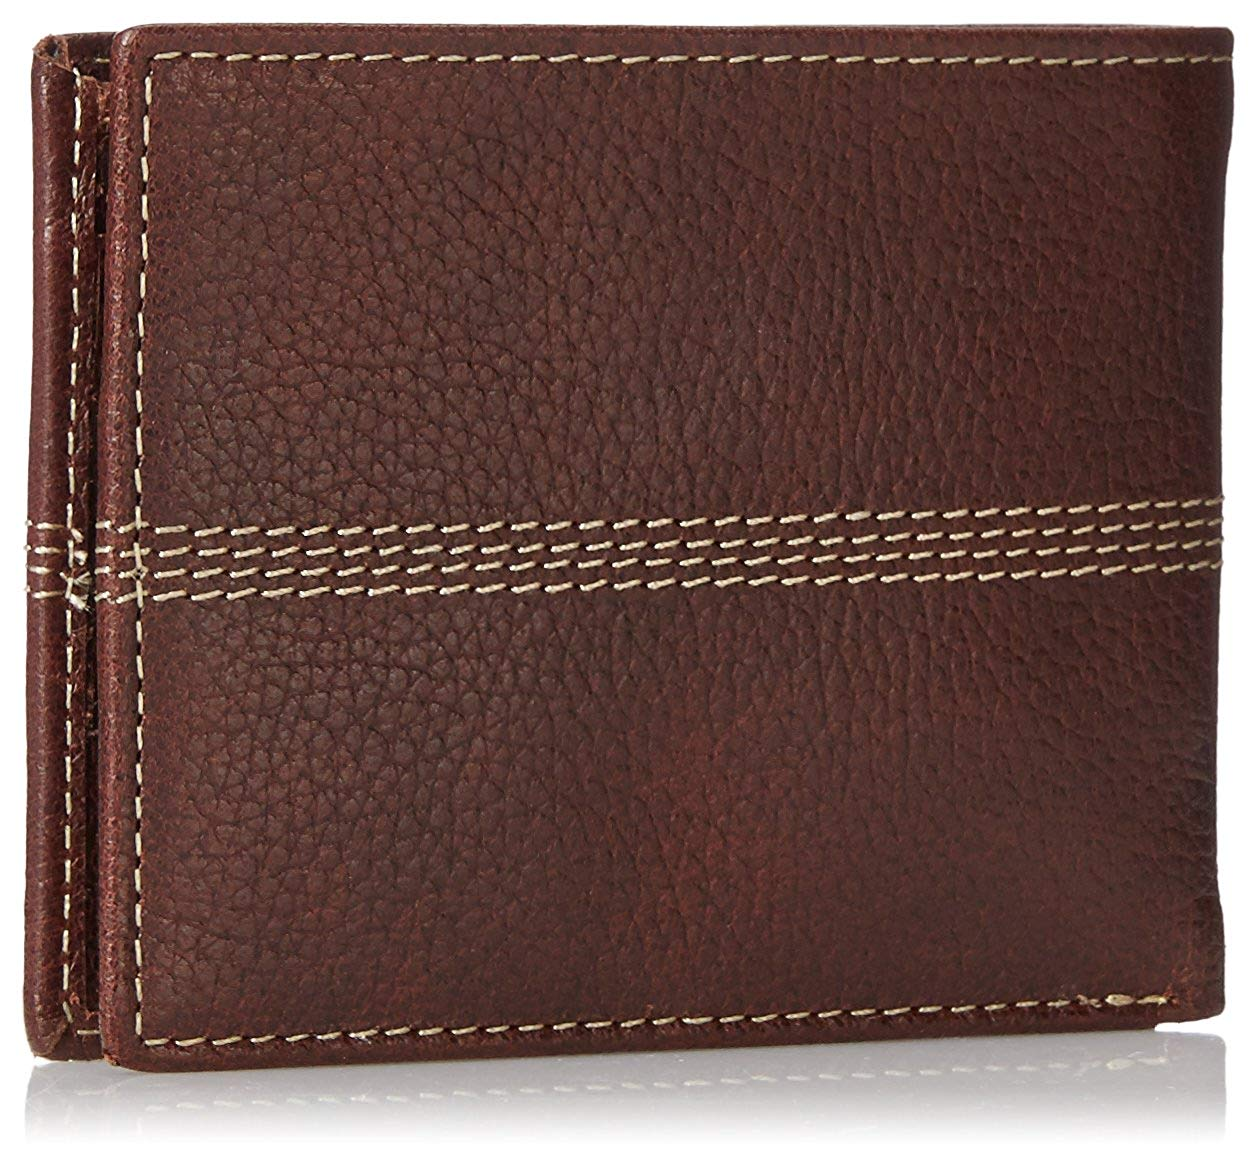 Timberland-Men-039-s-Genuine-Leather-Sportz-Quad-Bifold-Wallet thumbnail 10